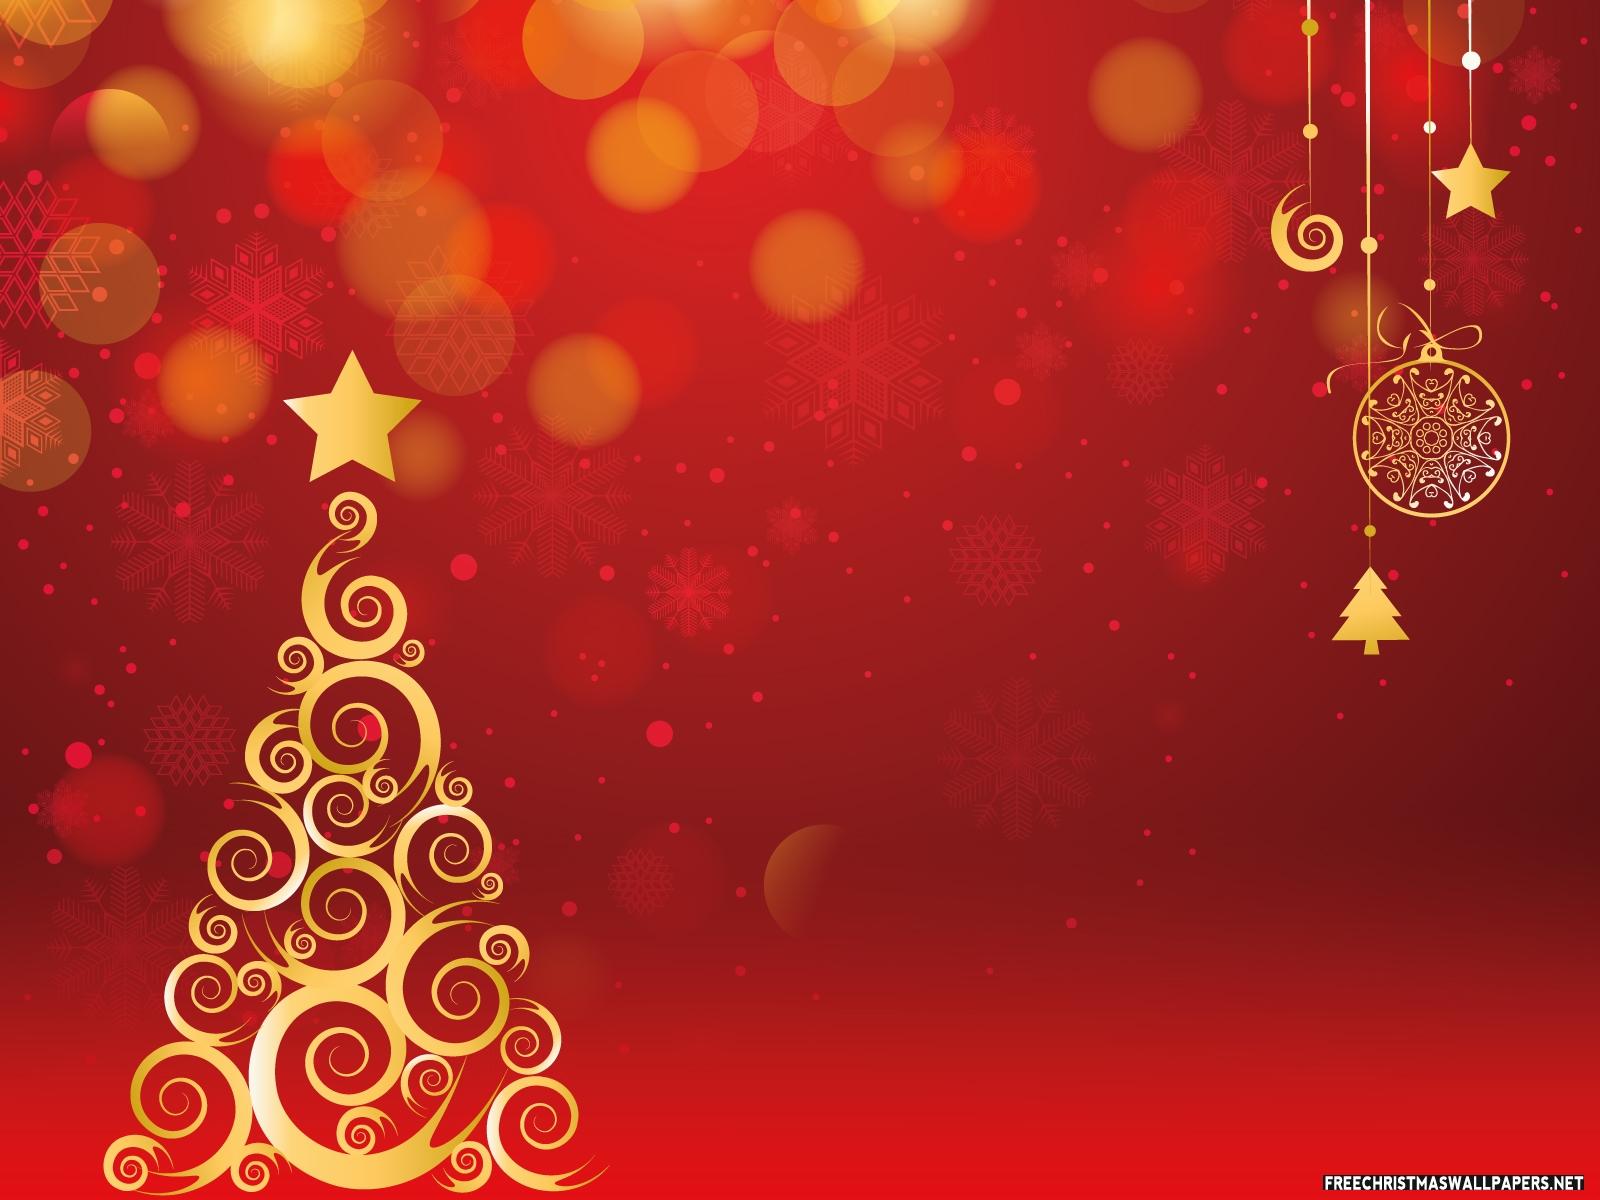 Wallpapernarium arbol de navidad for Natale immagini per desktop